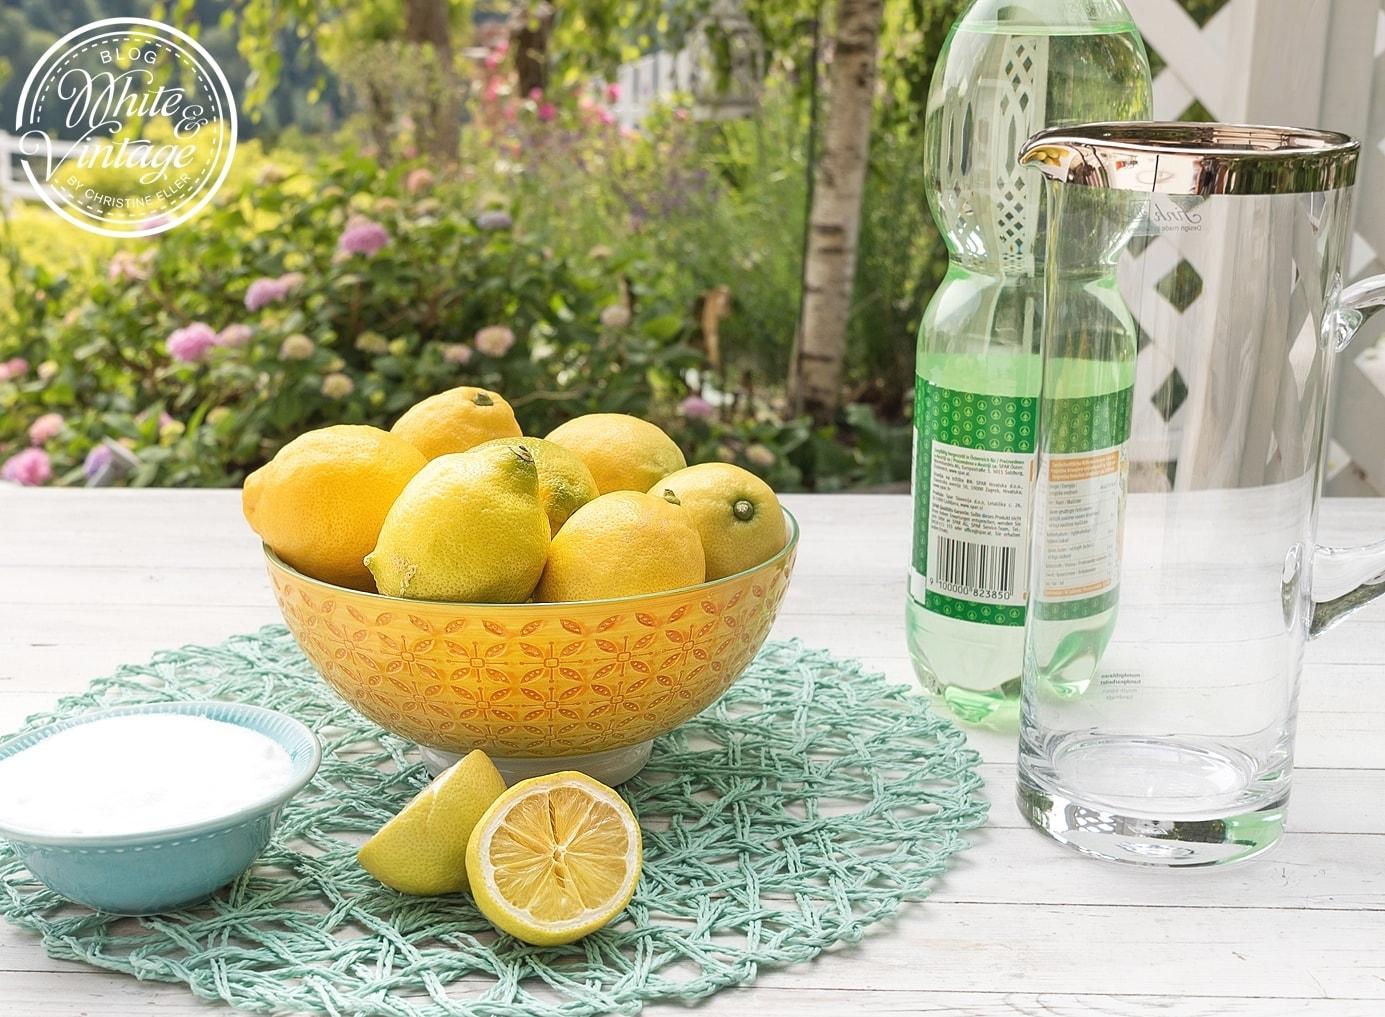 Rezept: Limonade selber machen.